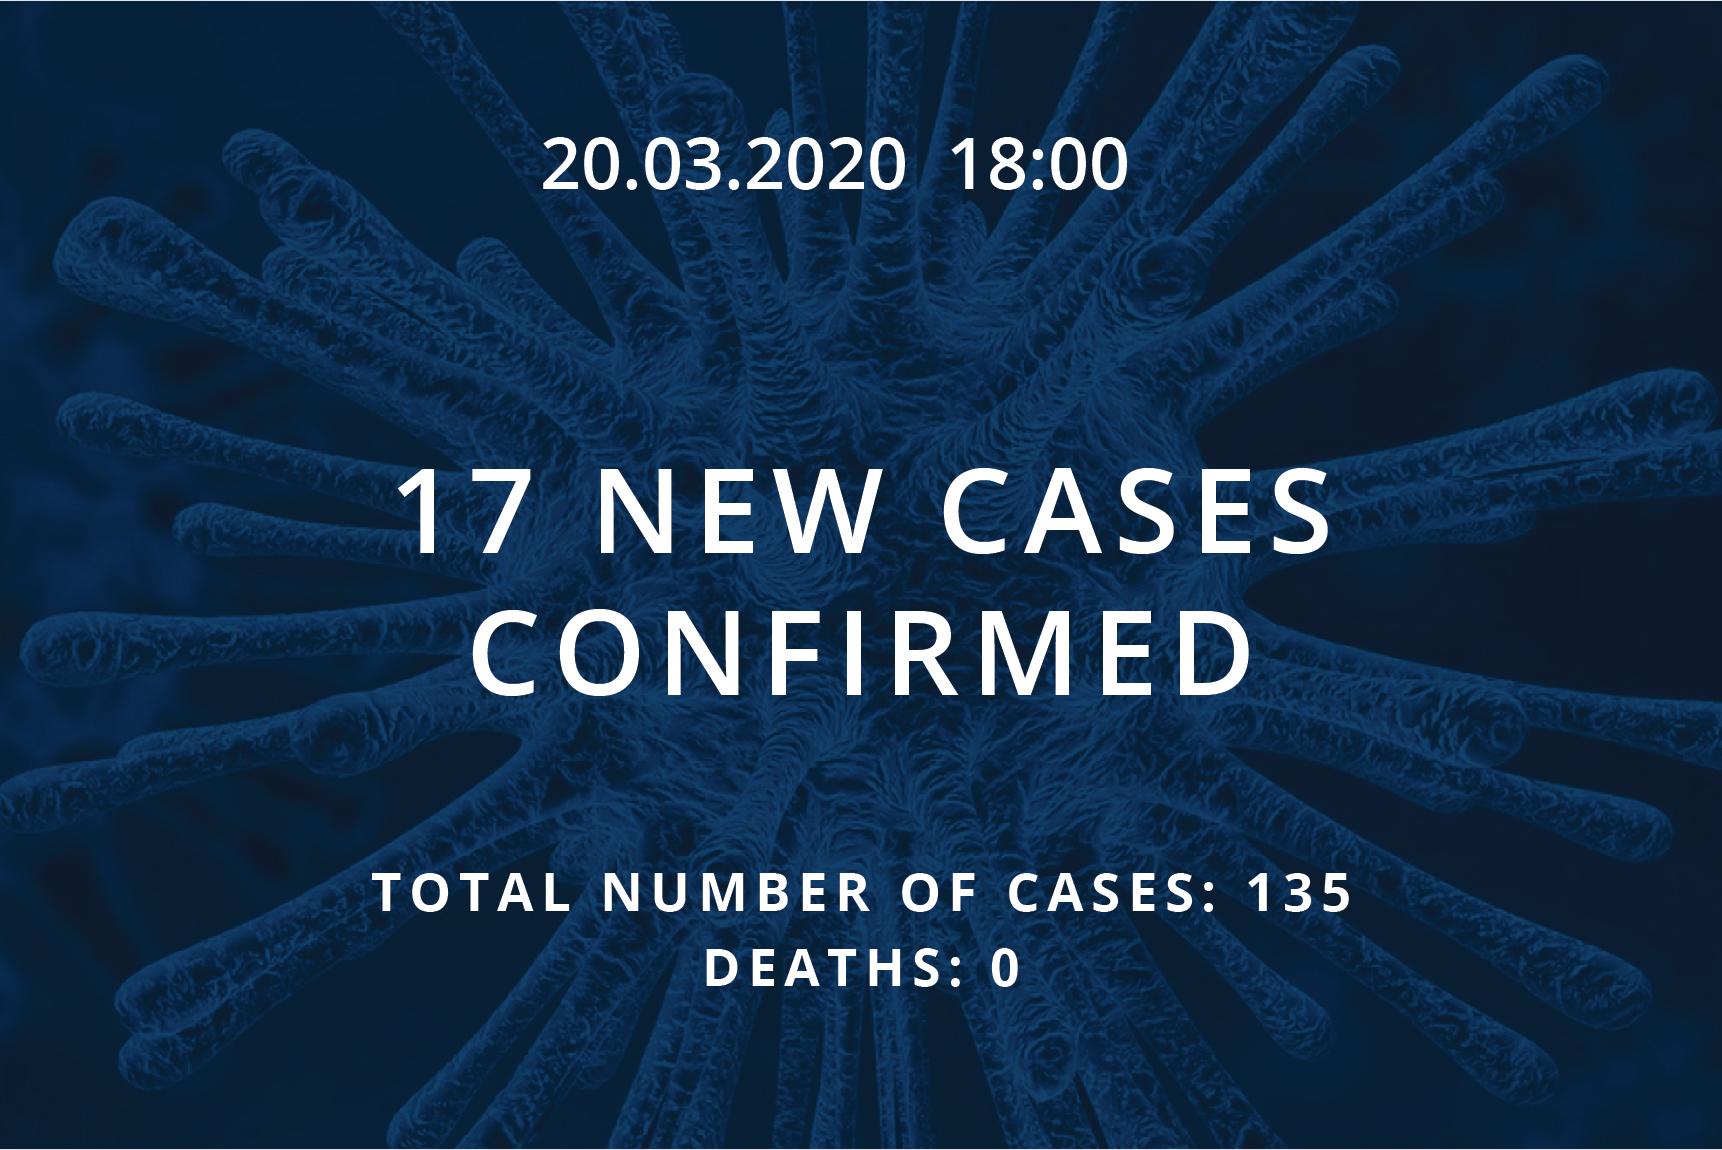 Information about coronavirus COVID-19, 20.03.2020 at 18:00